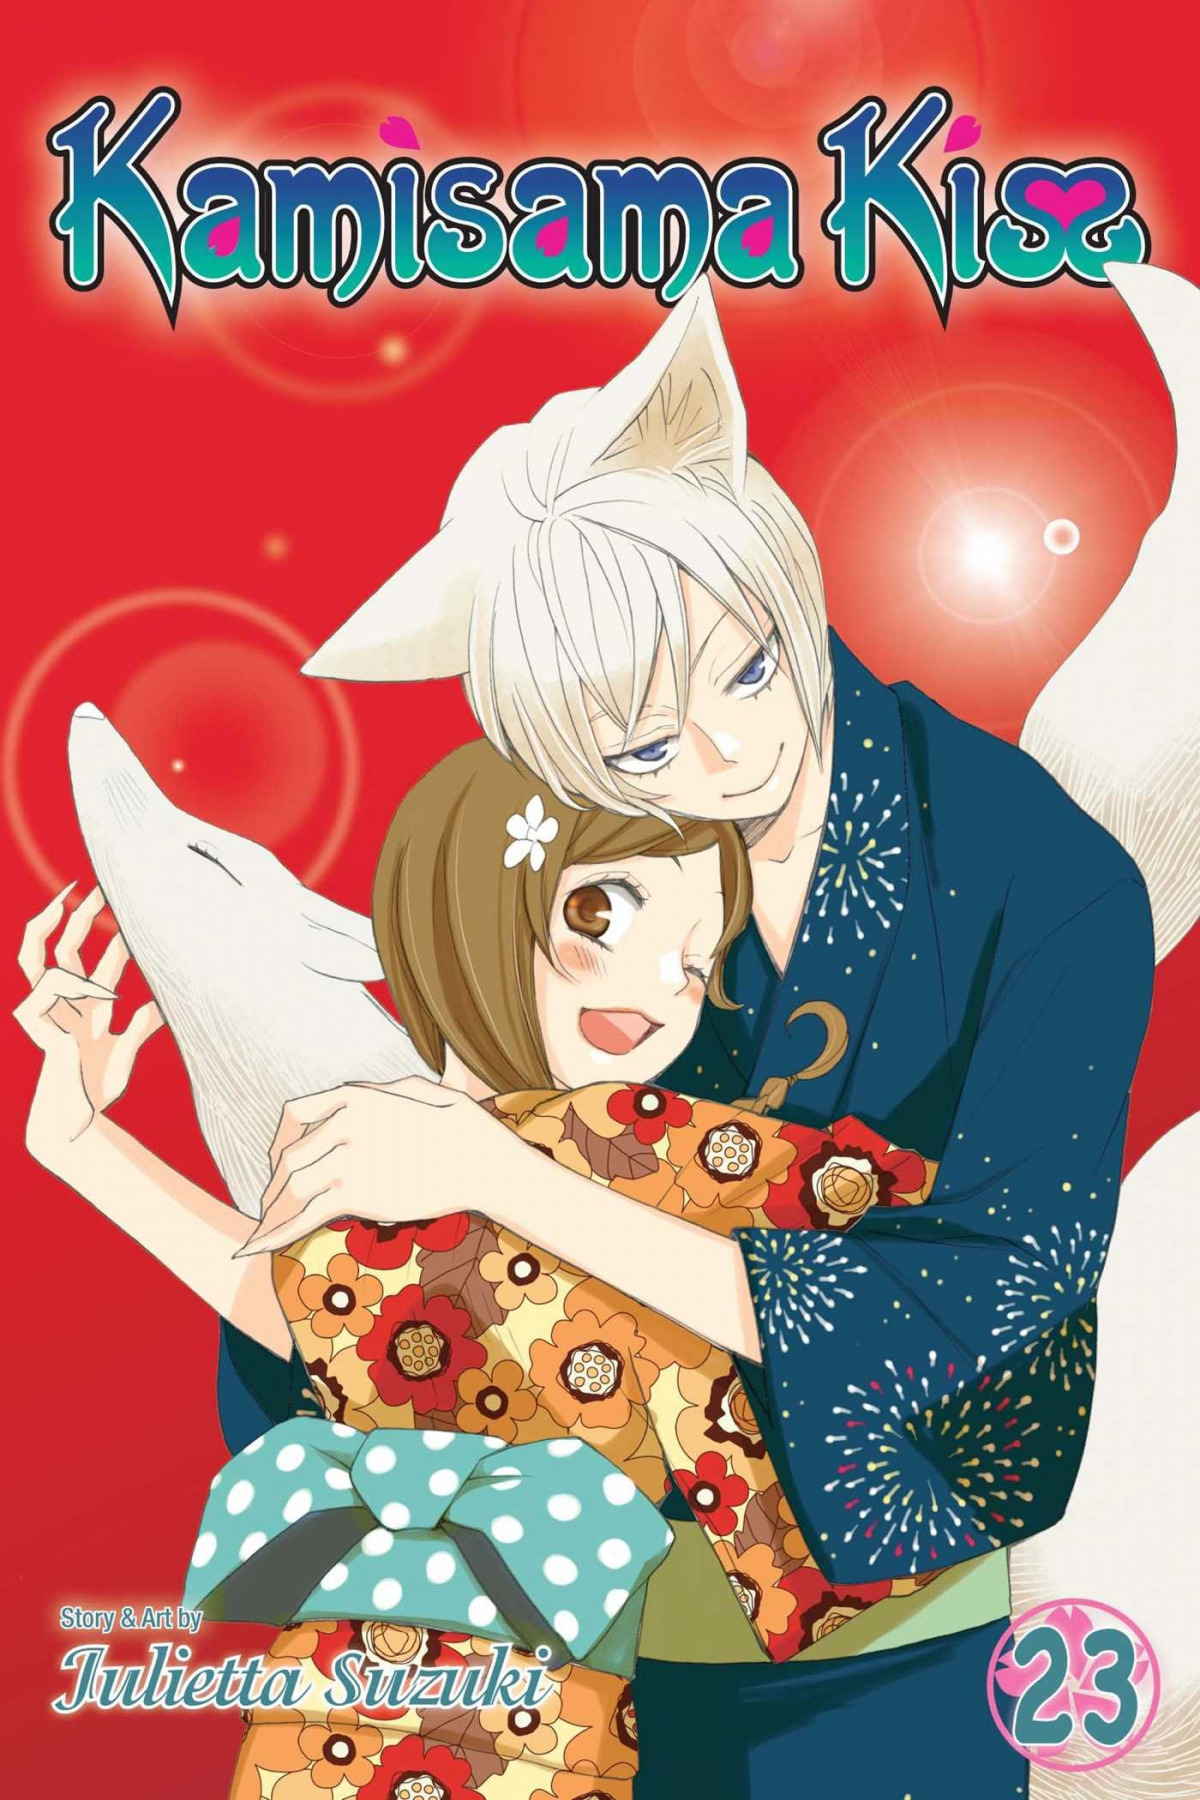 (suzuki).kamisama kiss 23 (simon and sch)